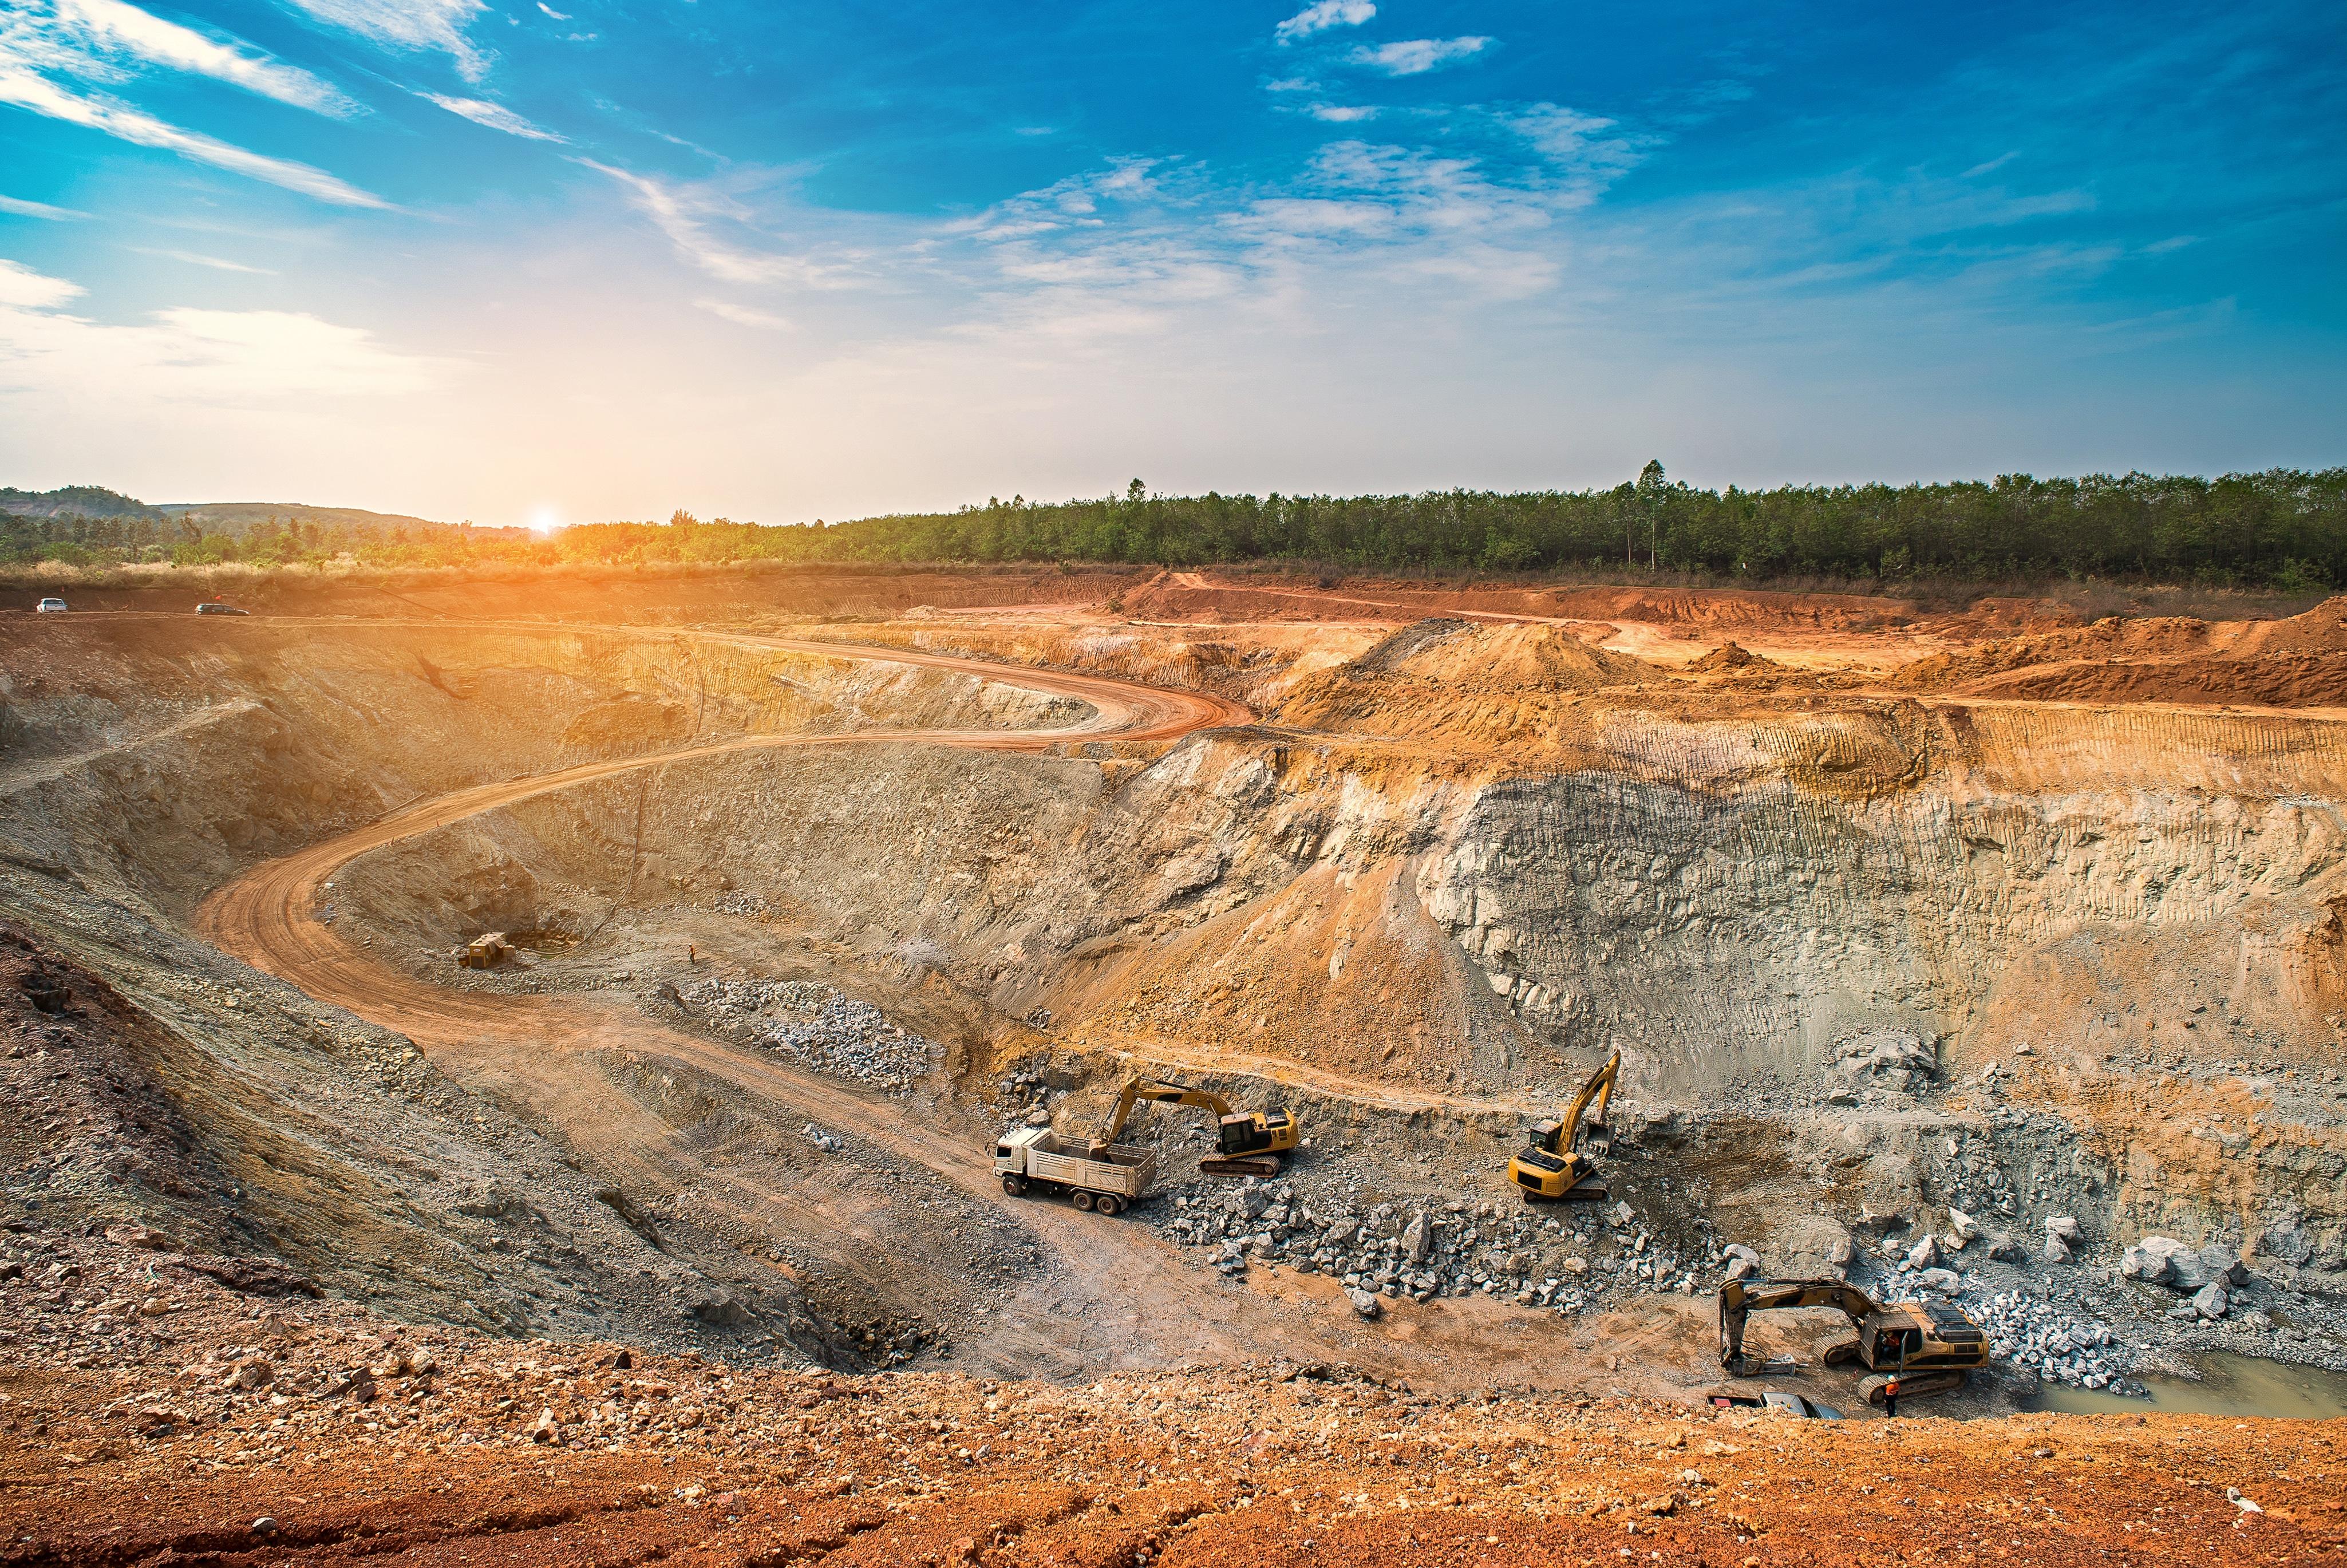 Benton and Sokoman Expand the Area Containing Lithium-Bearing Pegmatite Dykes in Newfoundland